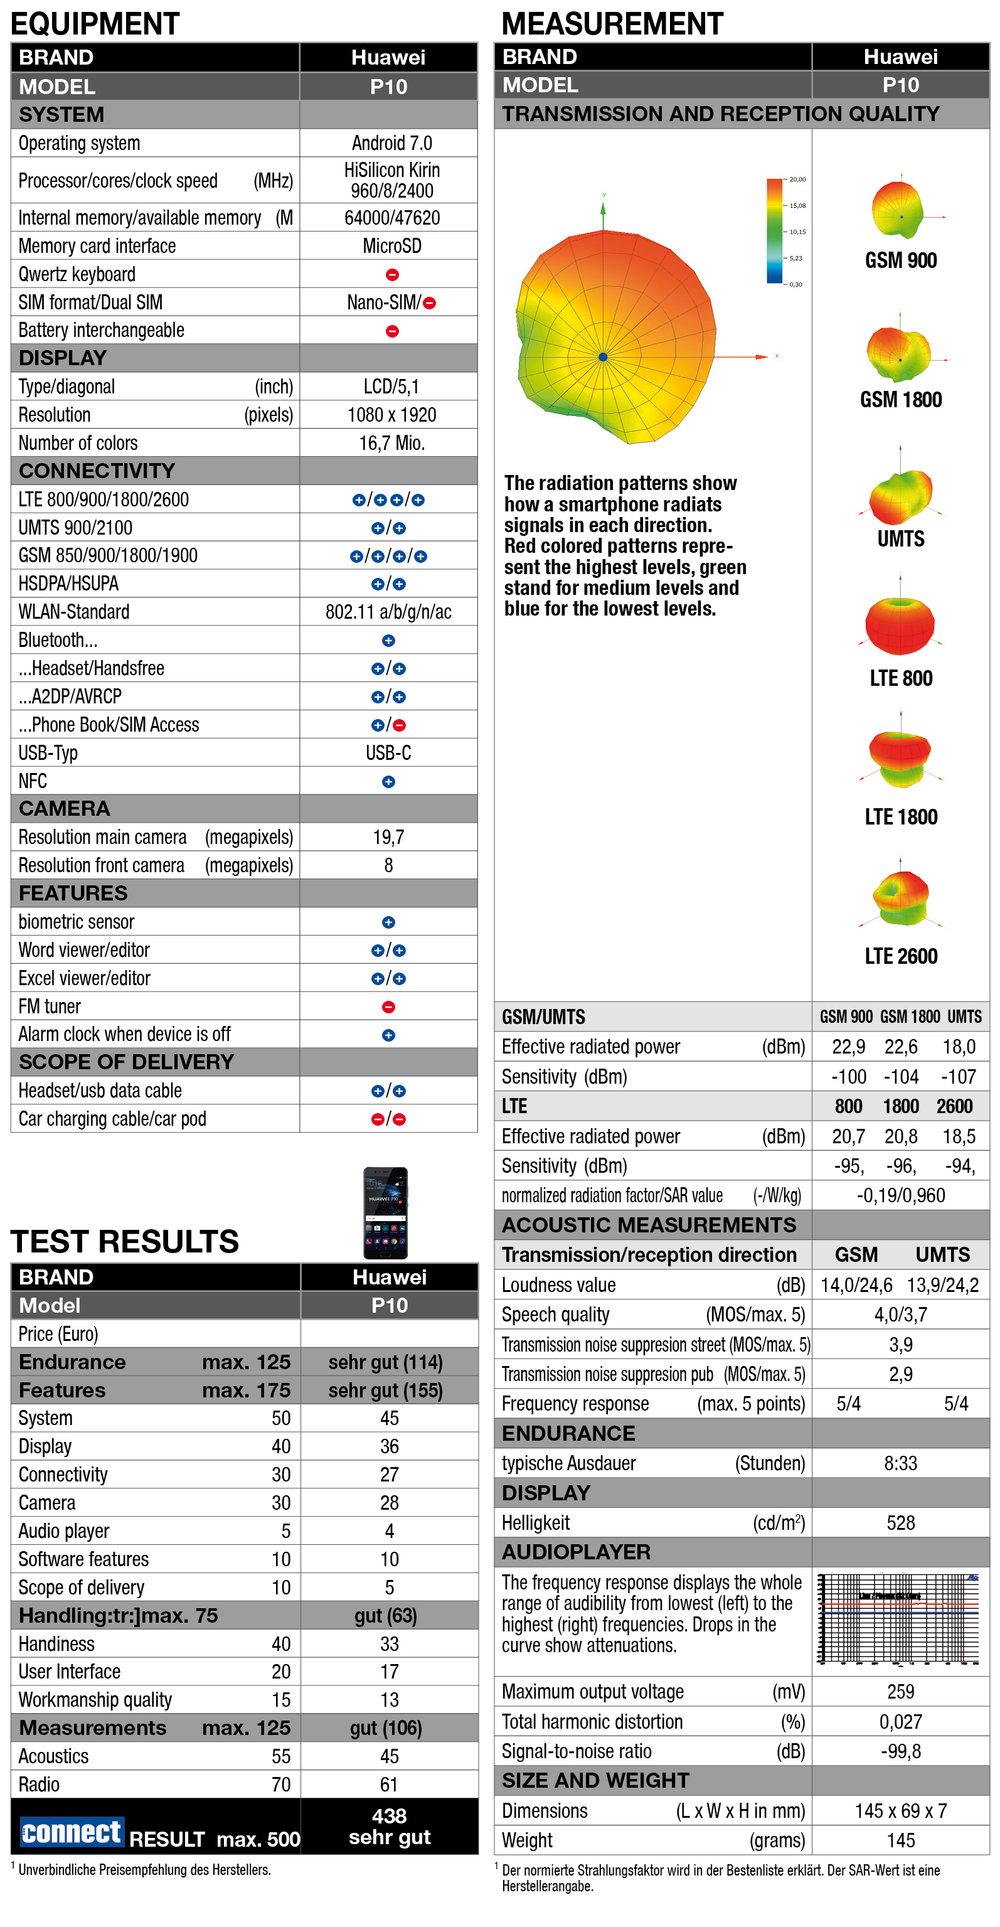 Tabelle Template.jpg